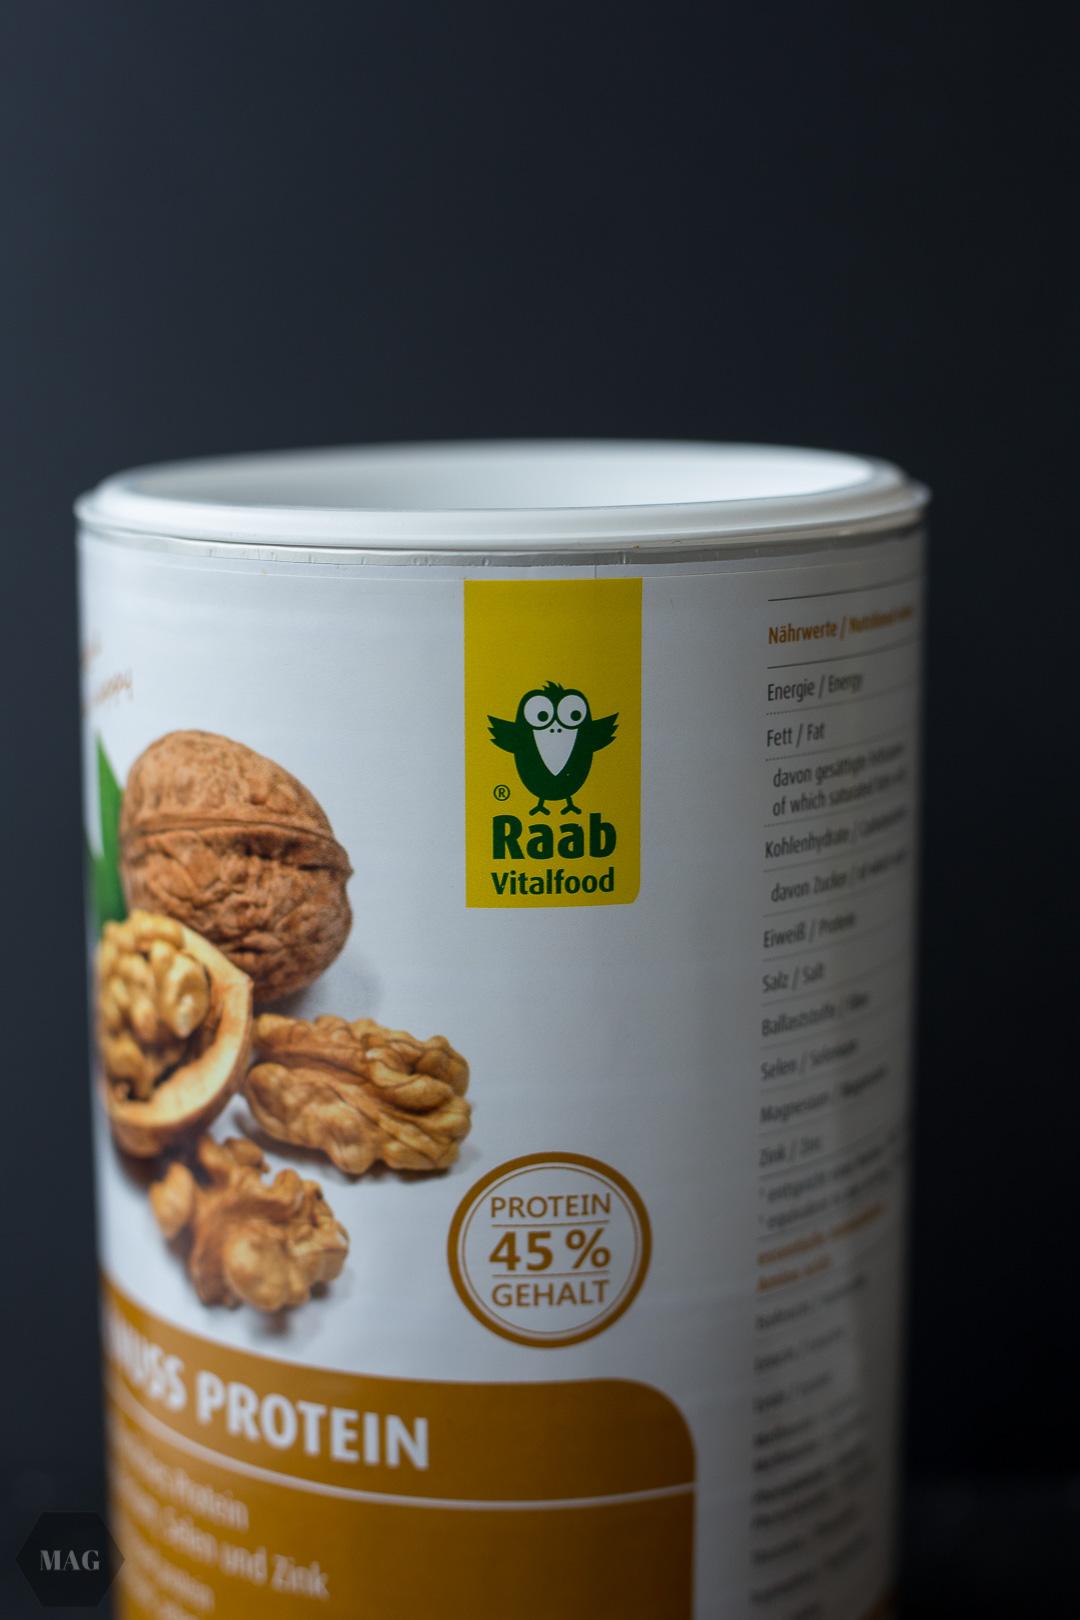 Walnuss-Brownie-Muffins, Bio Walnuss Protein, Raab Vitalfood, Nuss Muffins, vegane Nuss-Muffins, Walnuss Eiweiß, Bio Walnuss Eiweiß